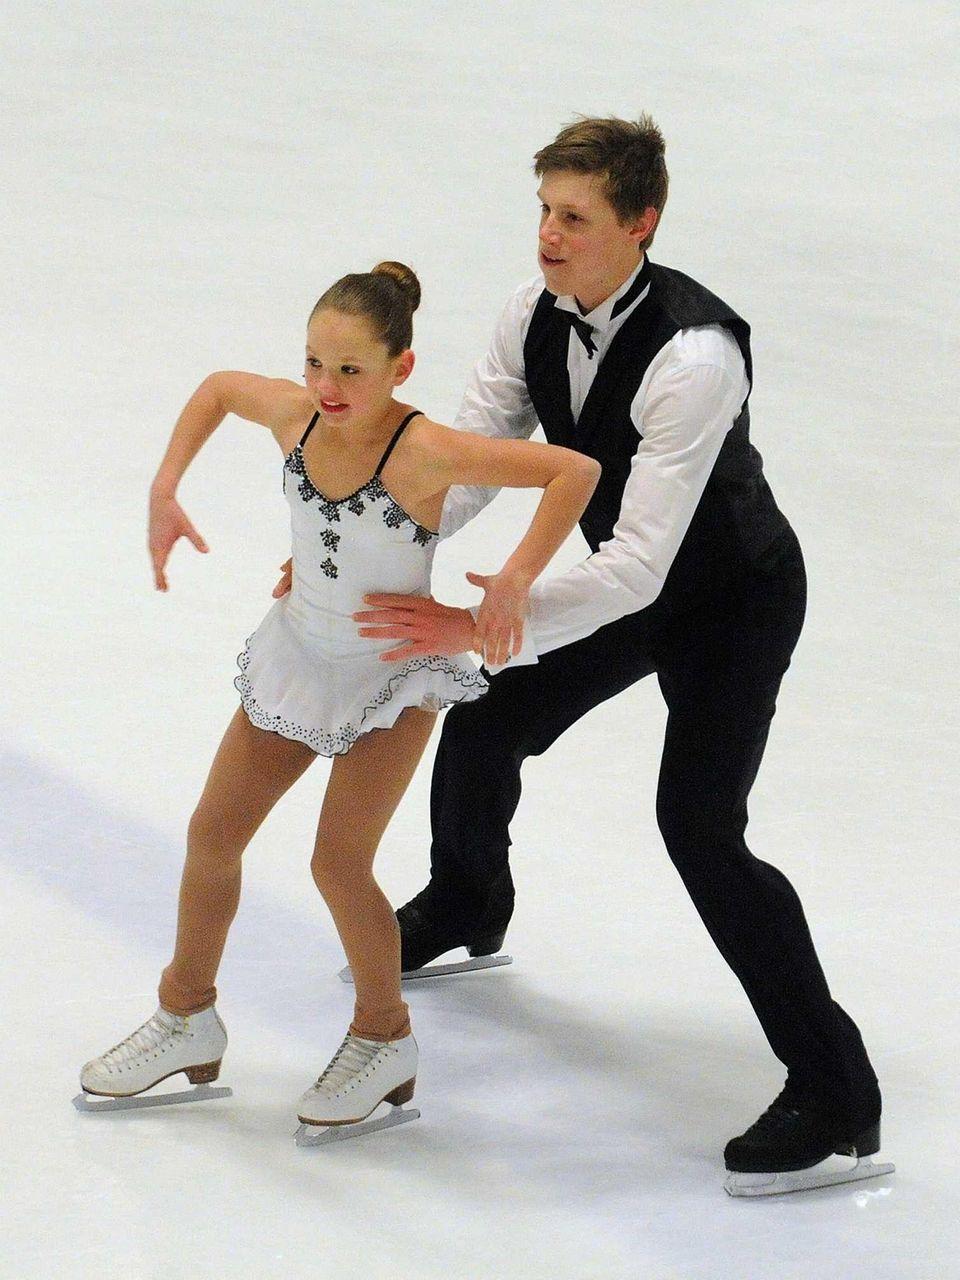 Figure skating pair Darbie Burke, 12, and Griffin